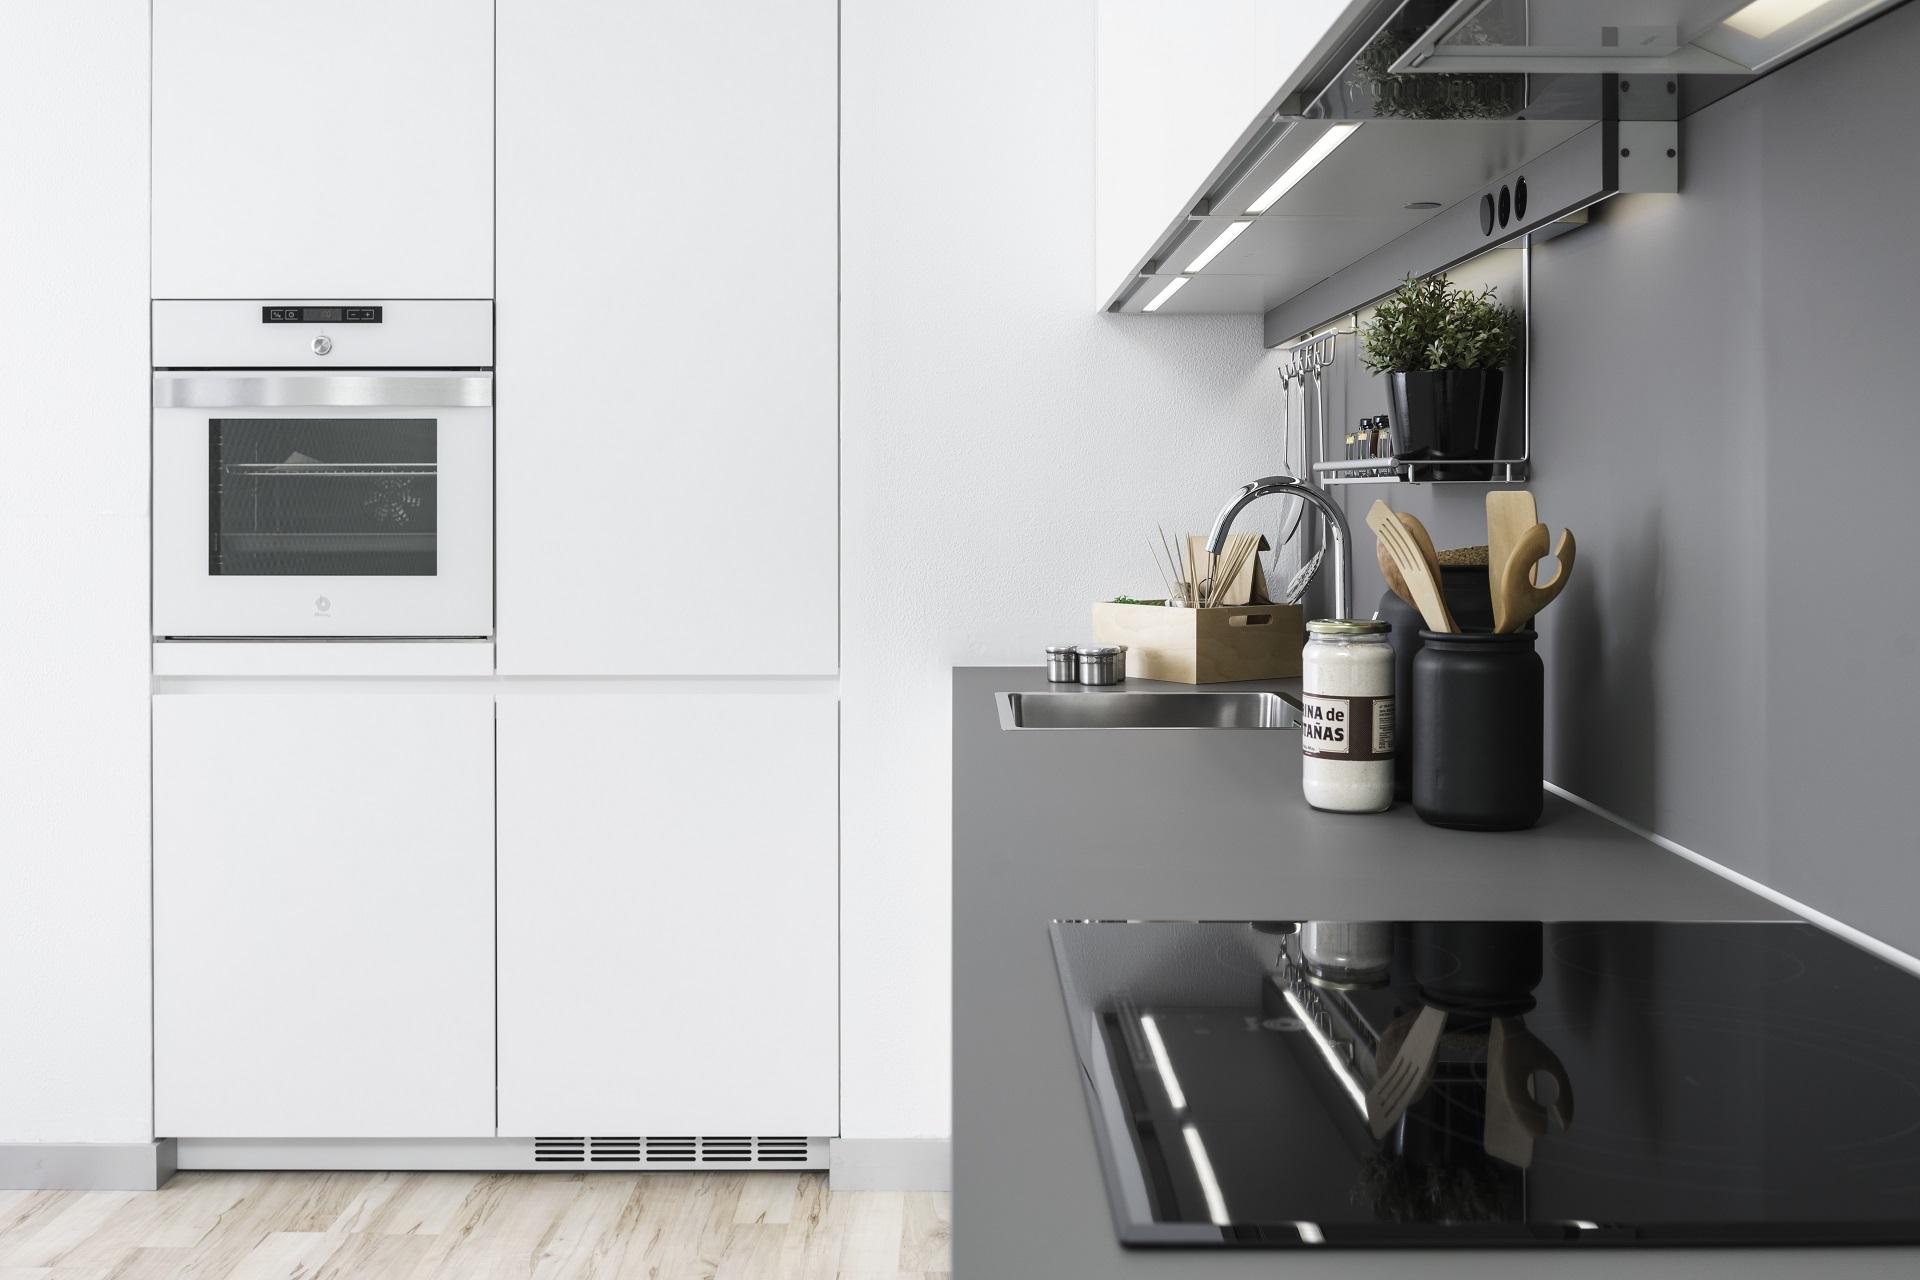 Image oferta-cambio-exposicion-cocina-santiago-interiores